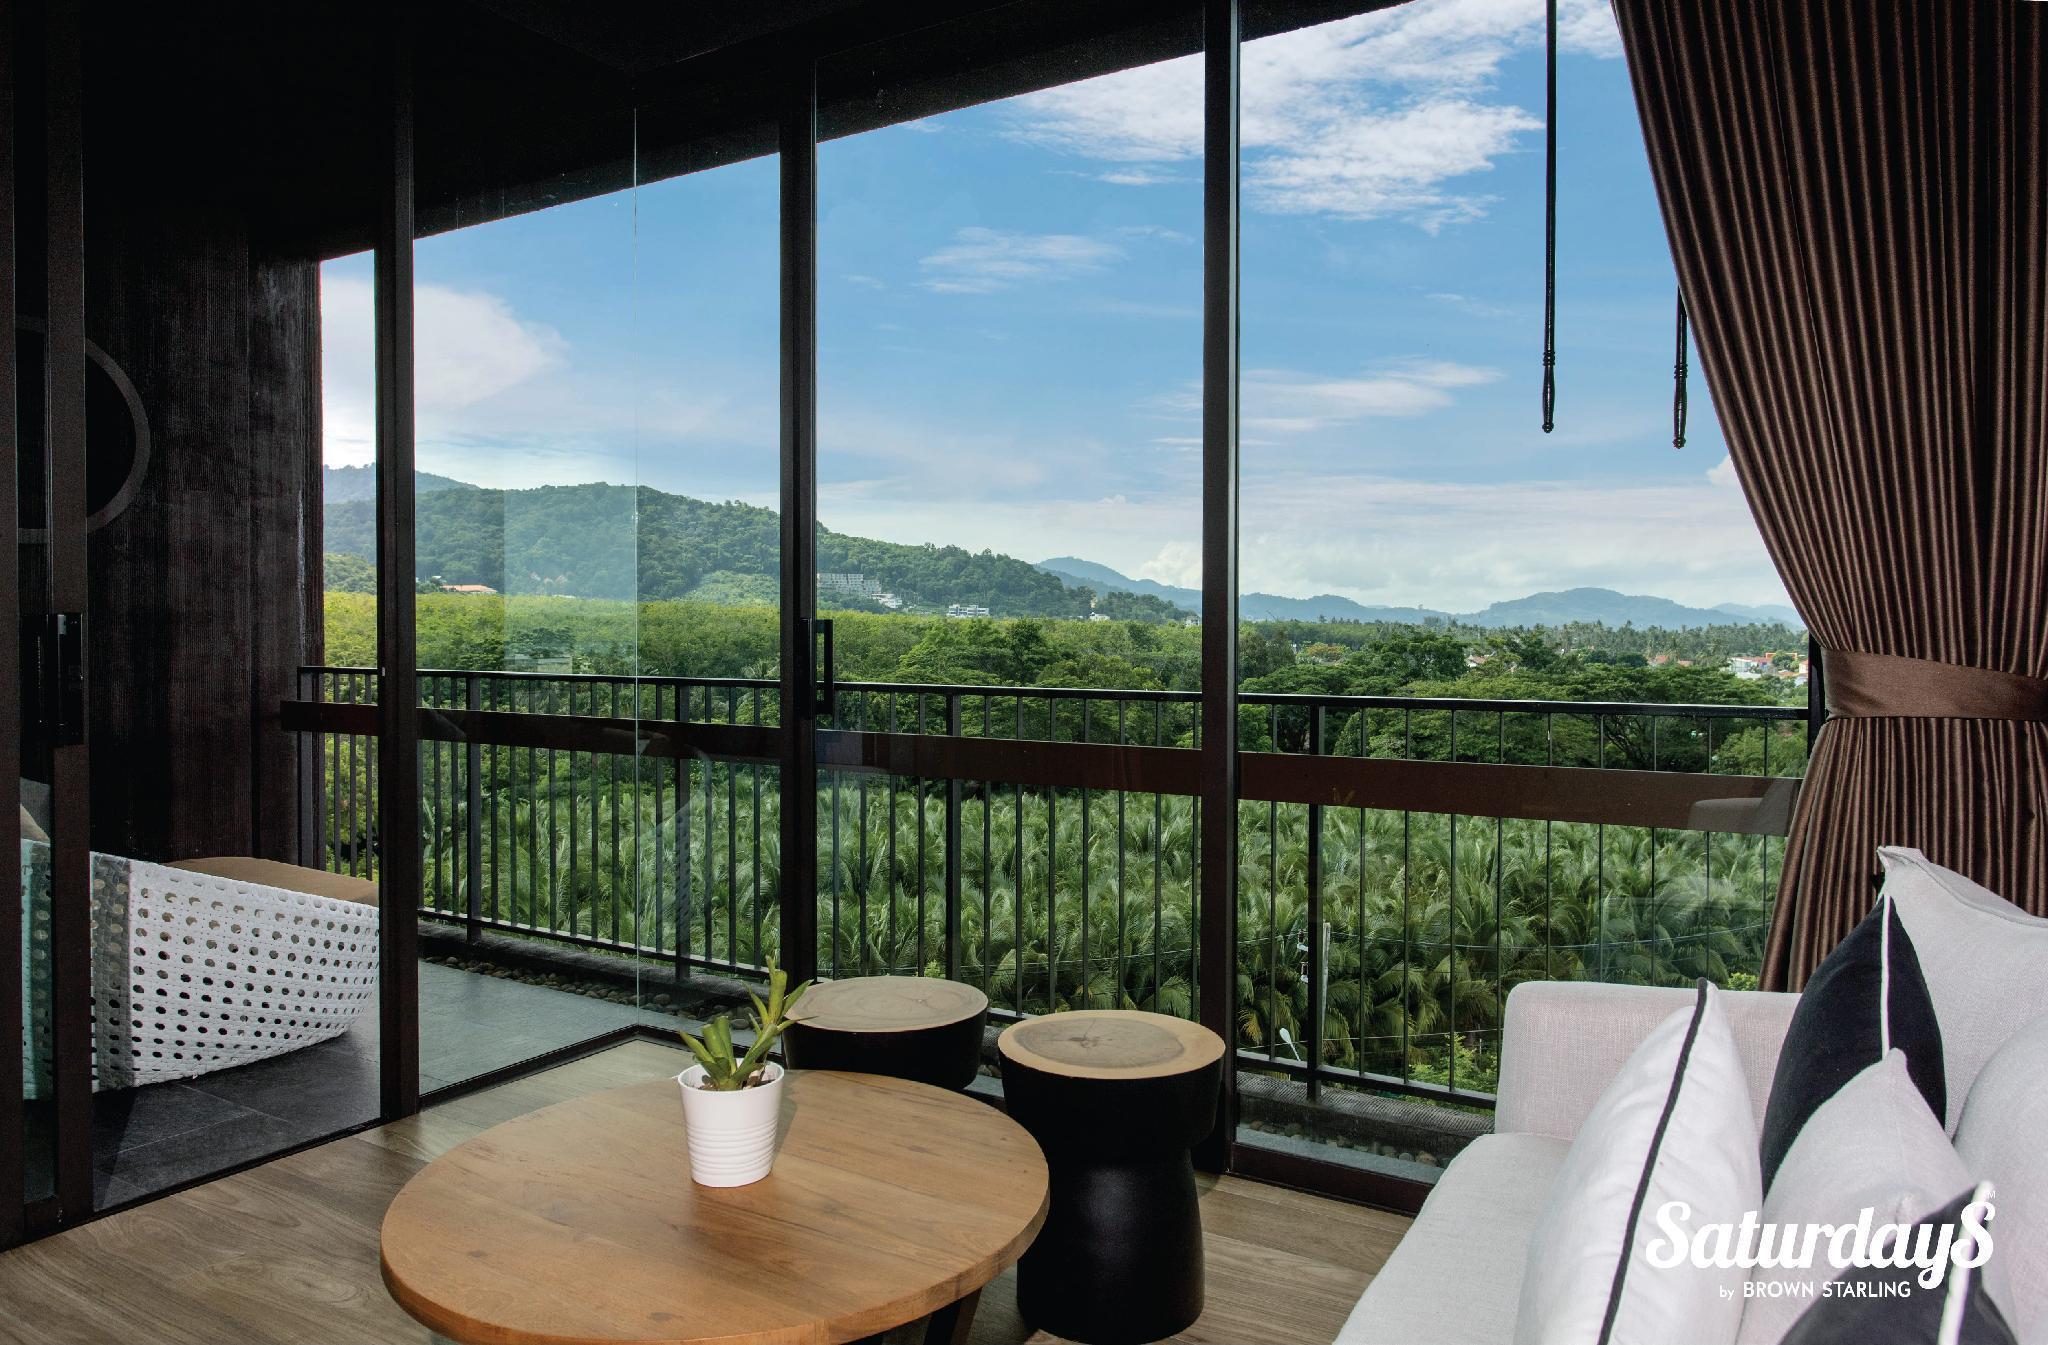 SW2- Saturdays Residence 2 BR Suit with balcony สตูดิโอ อพาร์ตเมนต์ 2 ห้องน้ำส่วนตัว ขนาด 86 ตร.ม. – หาดราไวย์